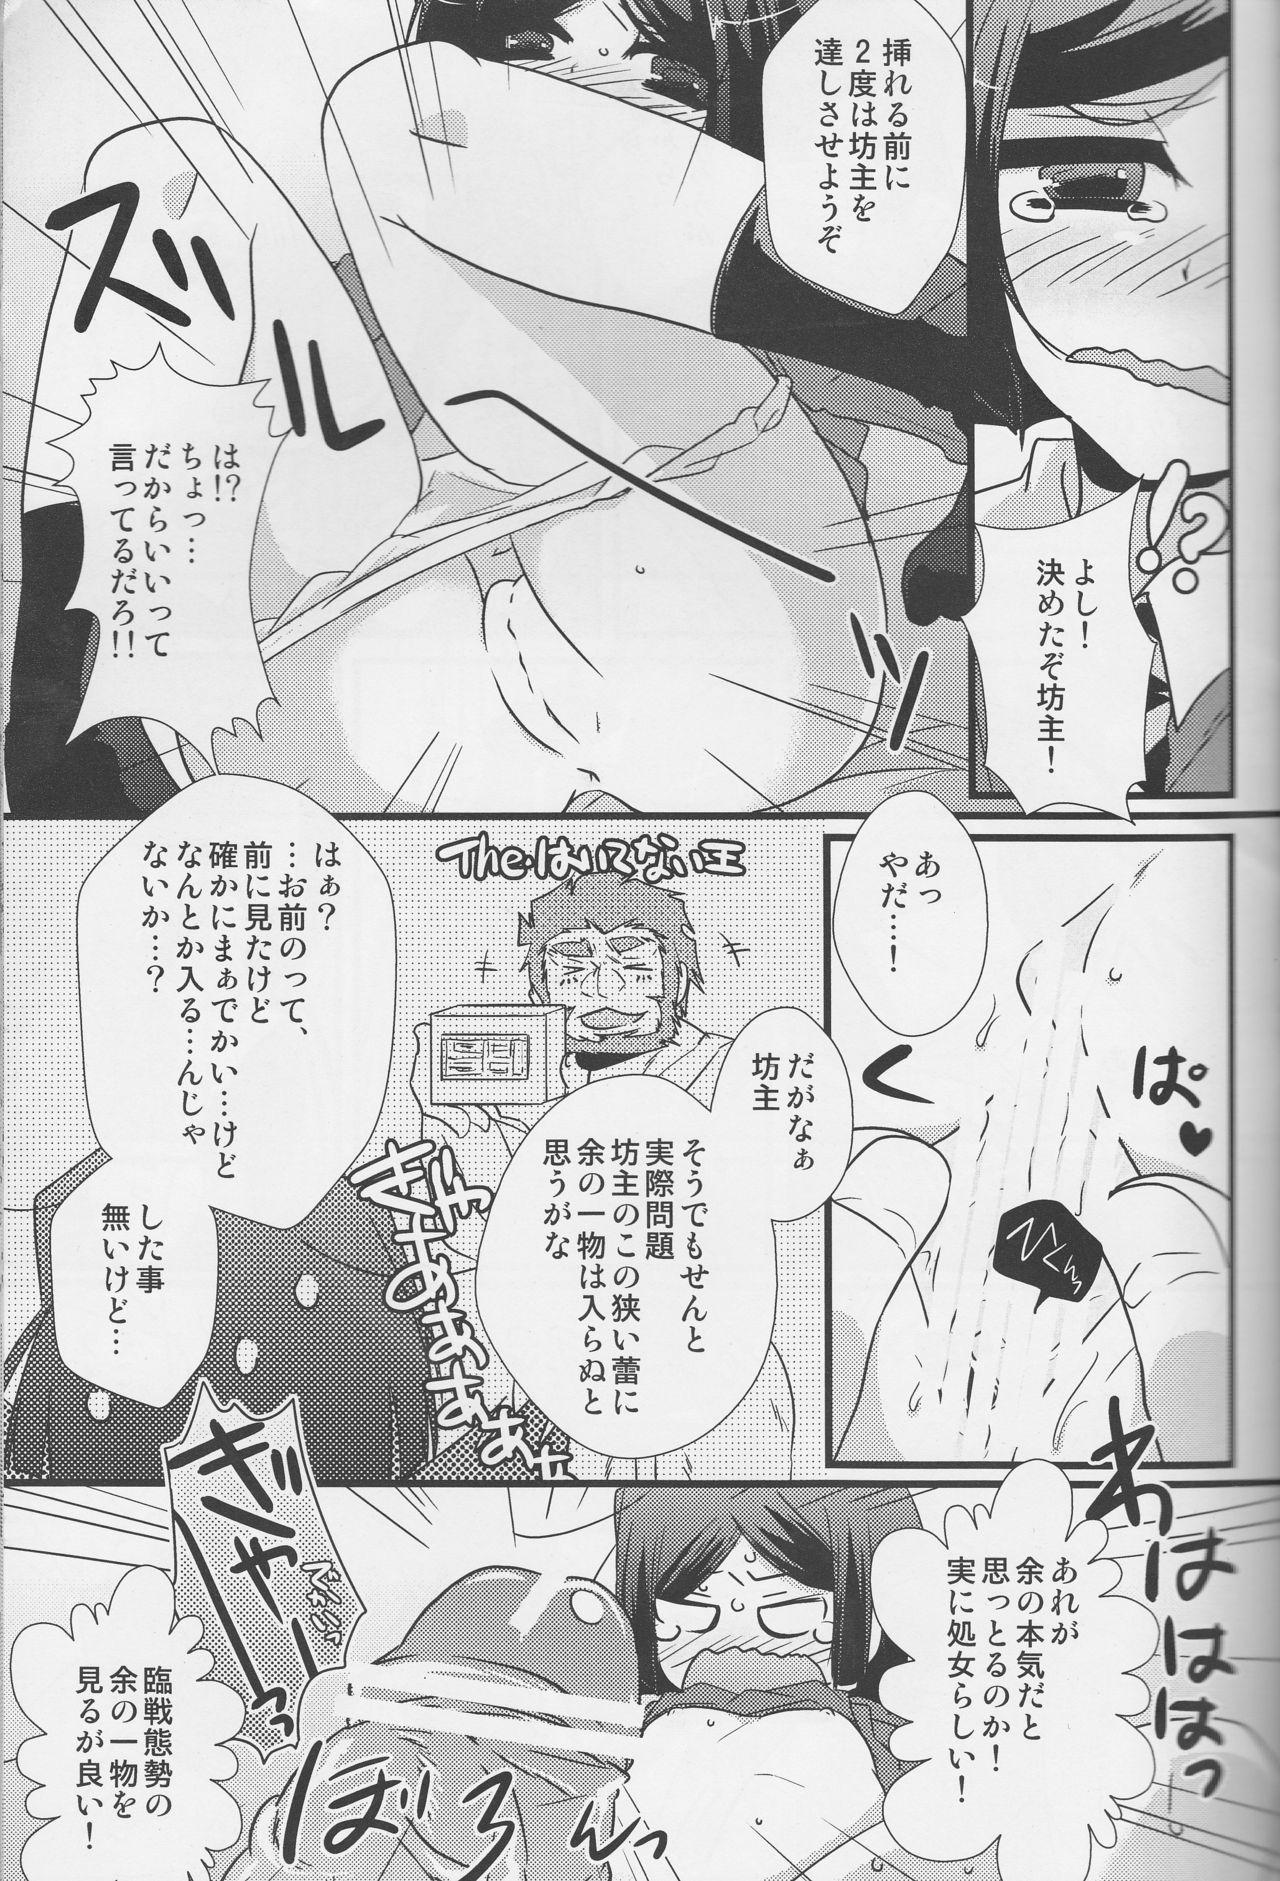 Tsubomi 10